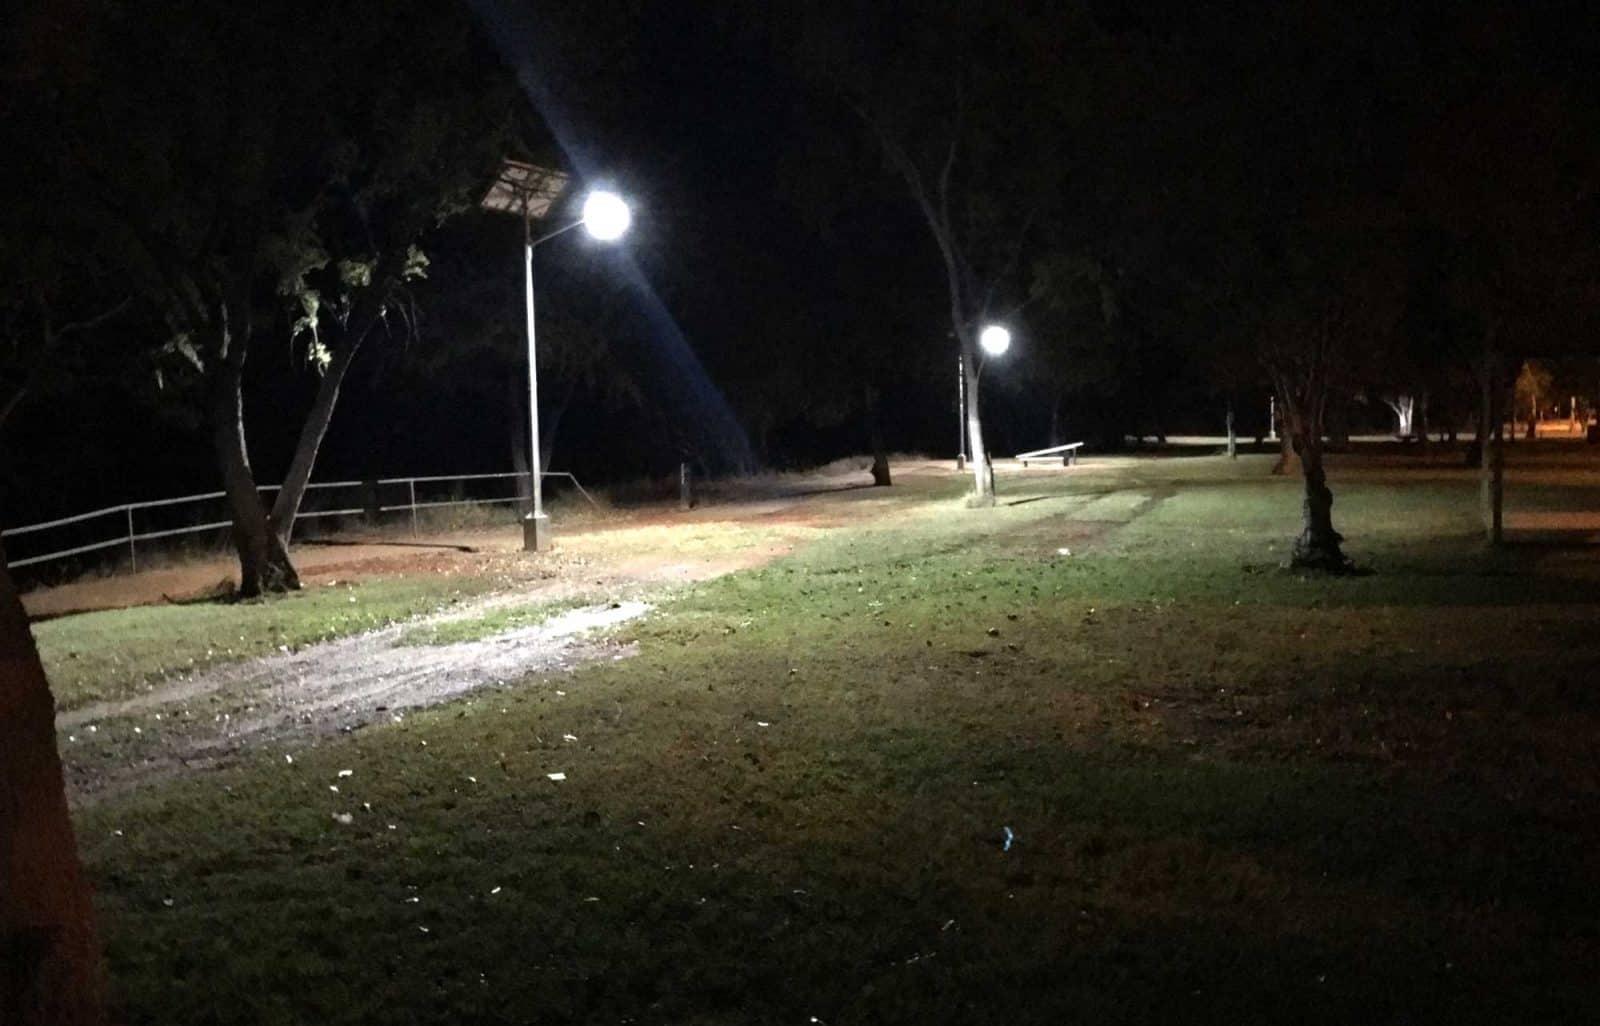 cyclone rated solar street lighting